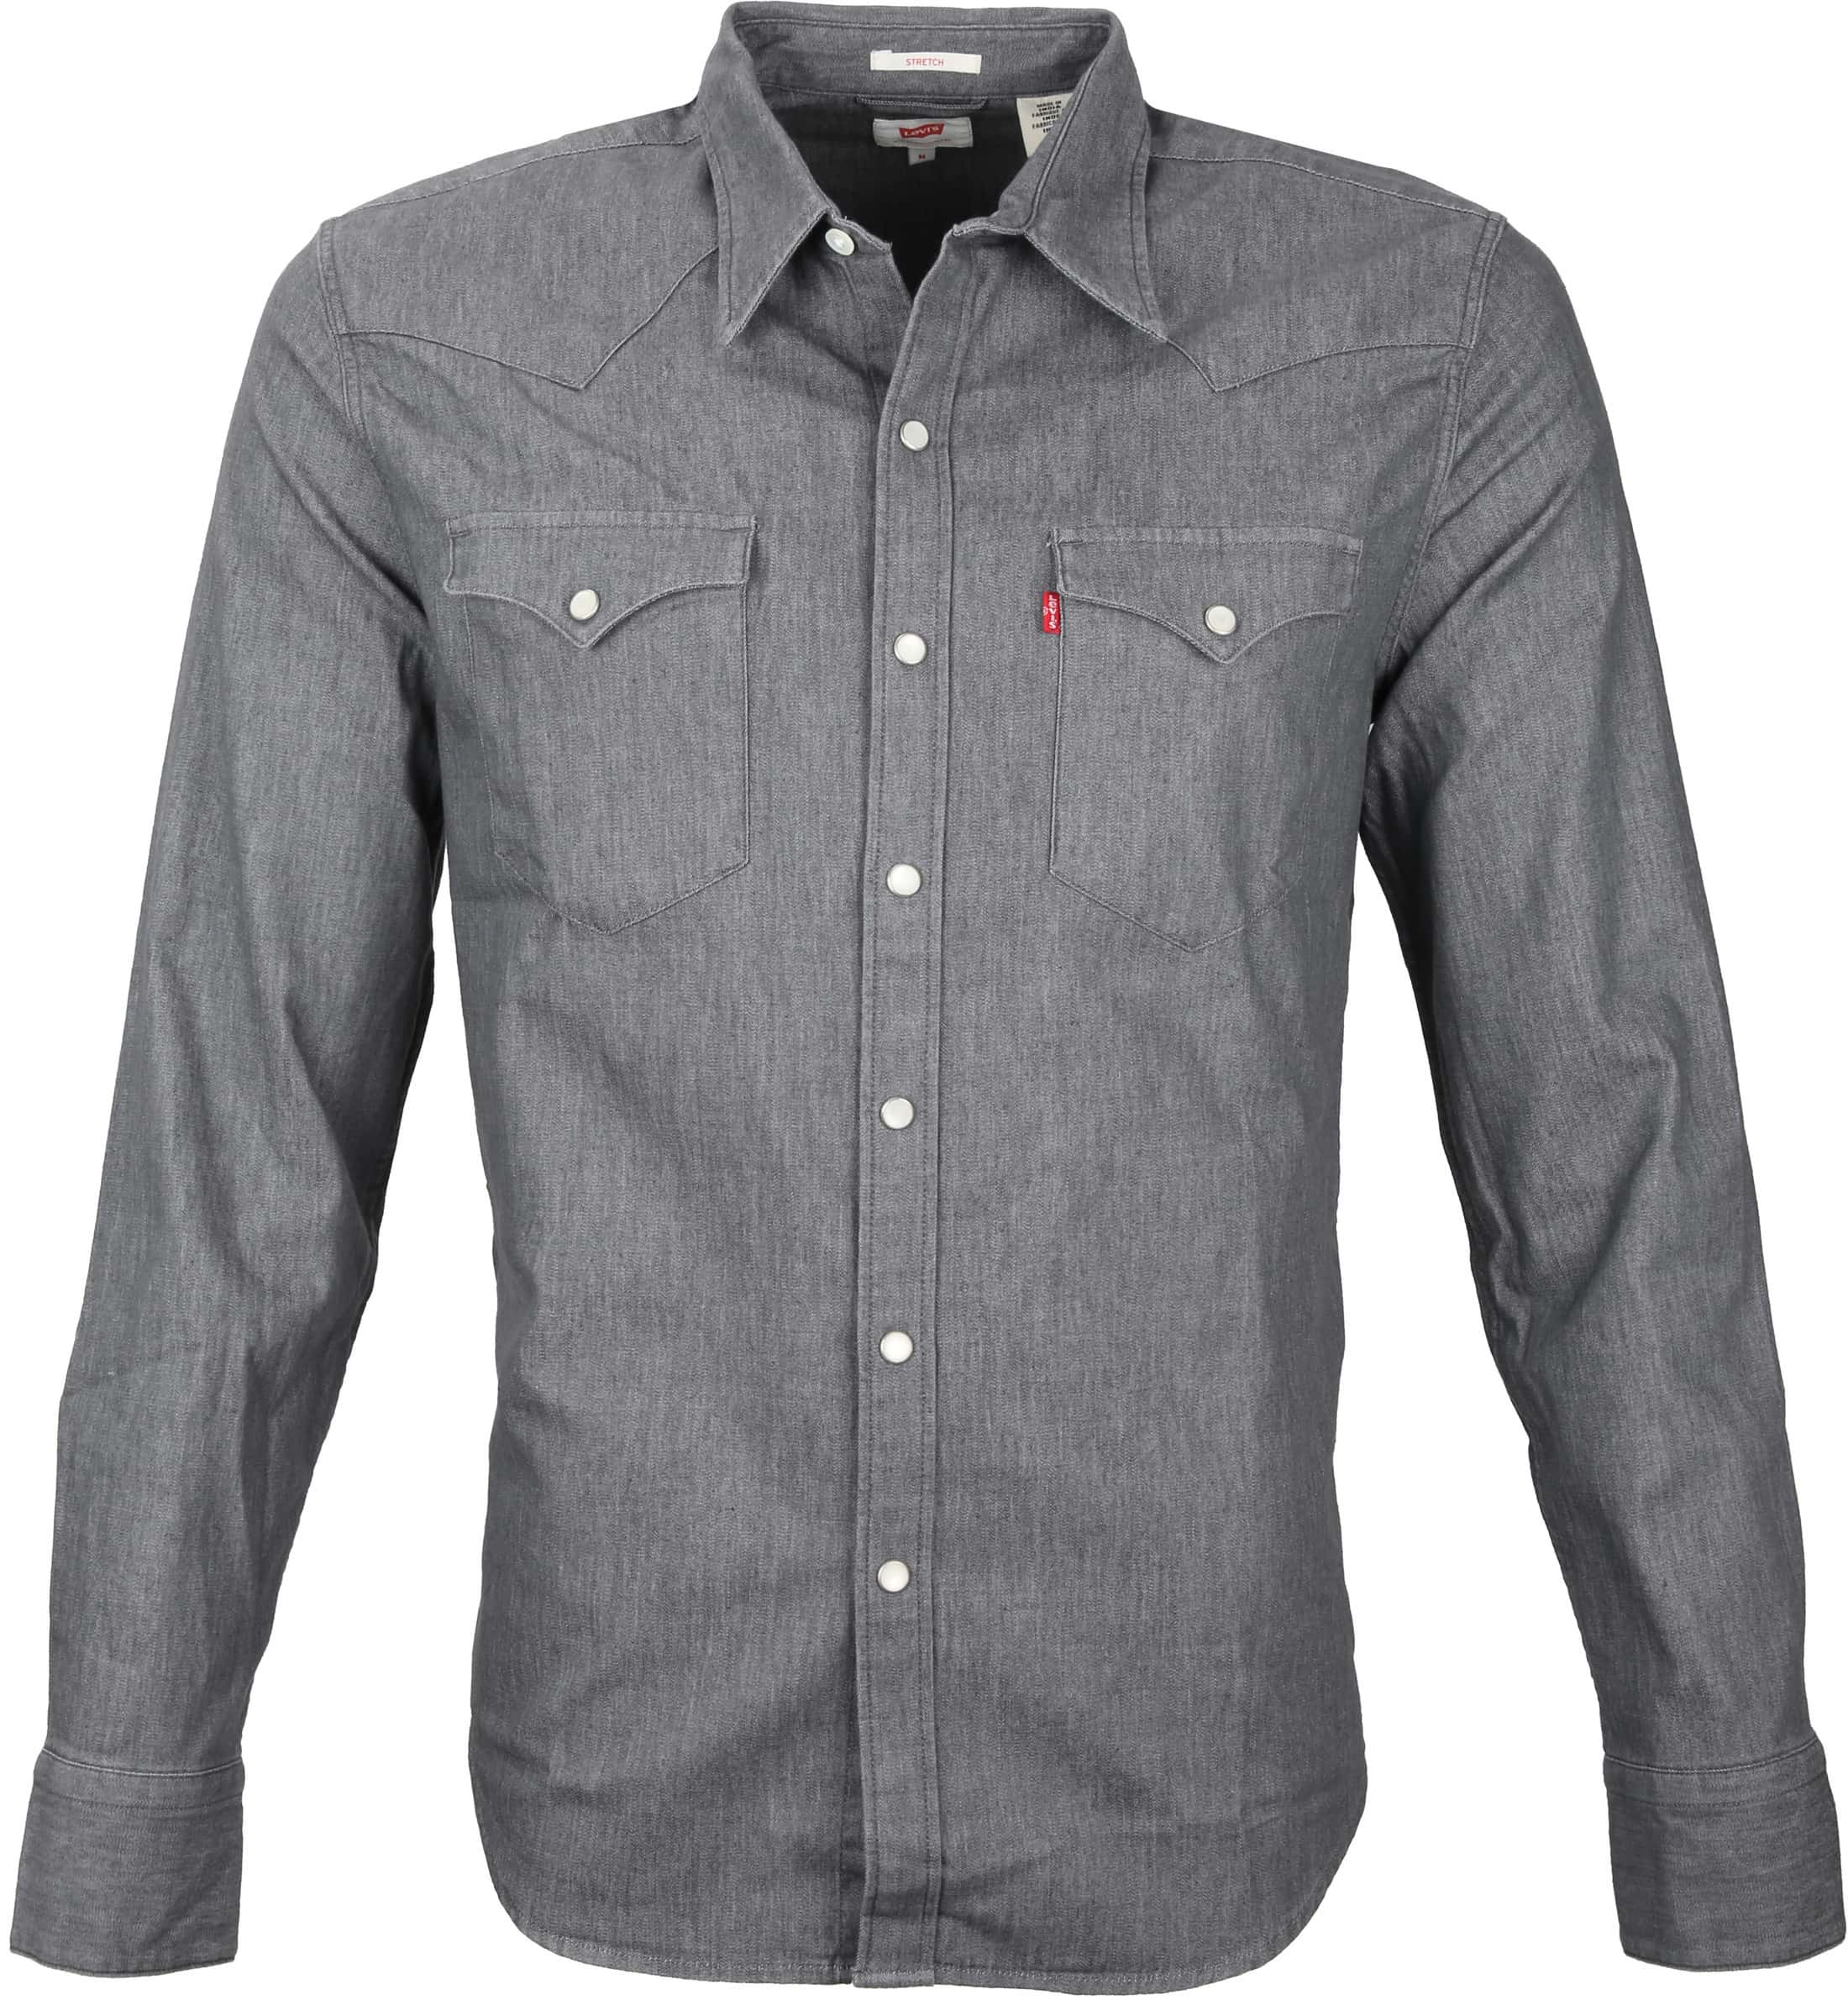 8101b78bd5 Levi s Barstow Western Shirt Grey 65816-0273 order online